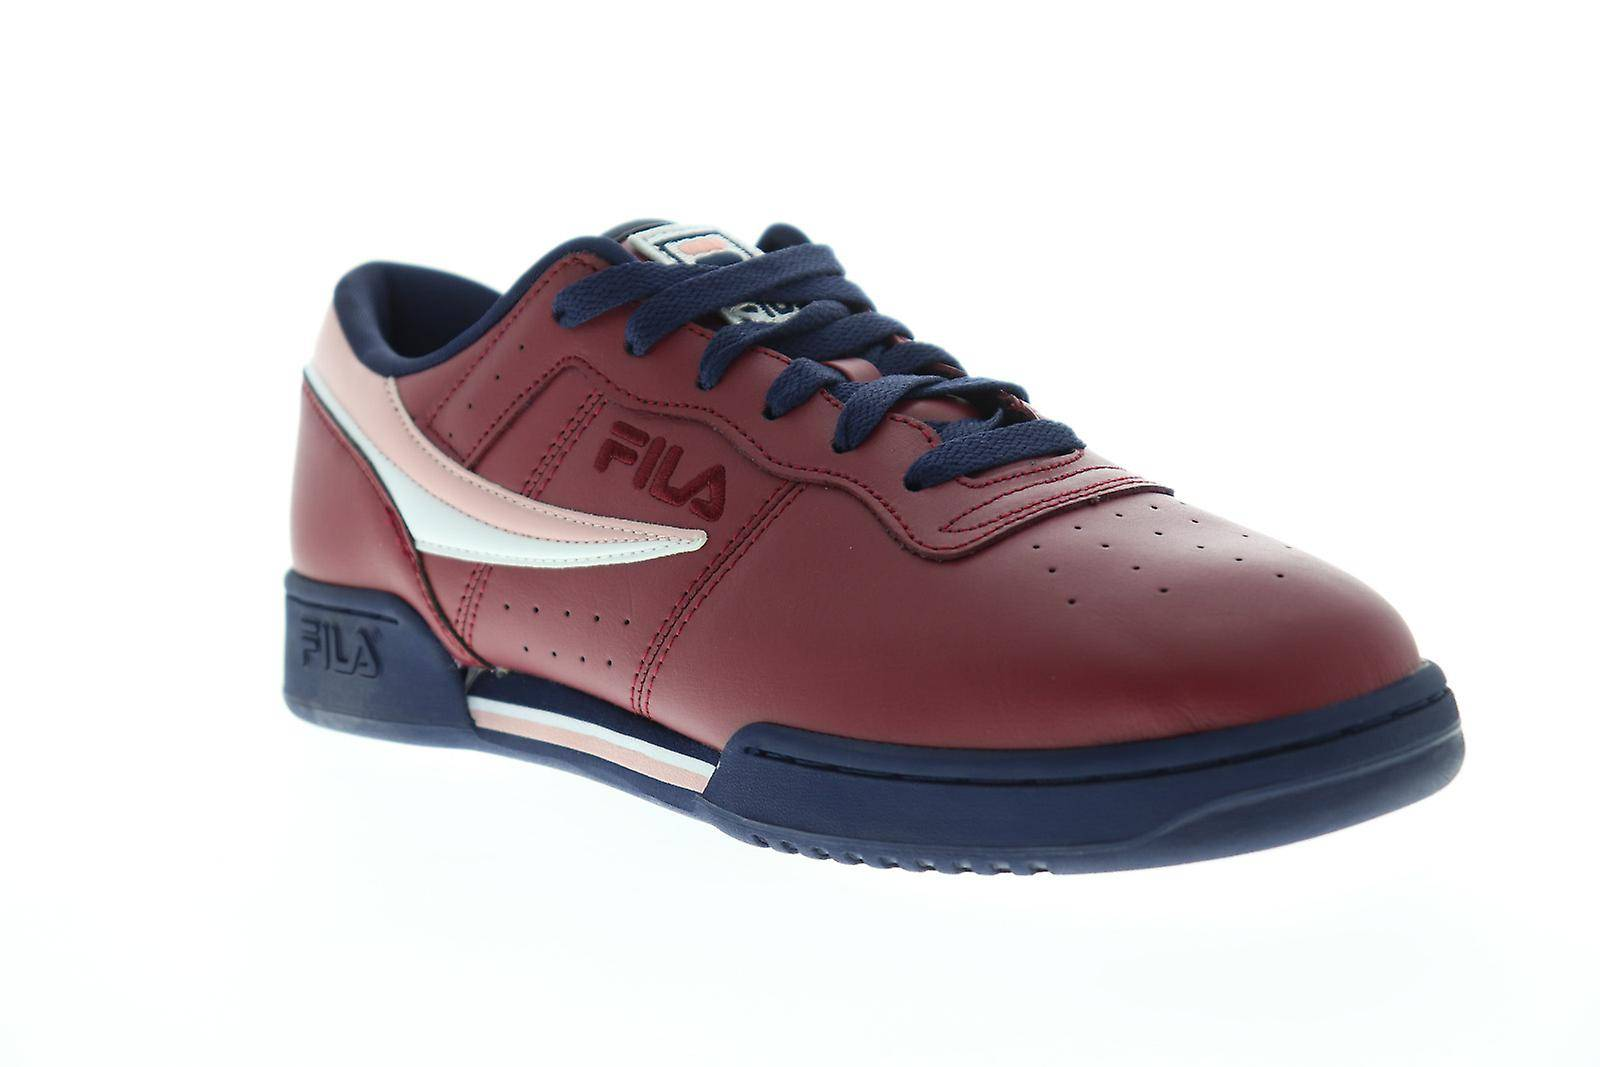 Fila Chaussures Fila Original Fitness Mens Red Casual Low Top Sneakers